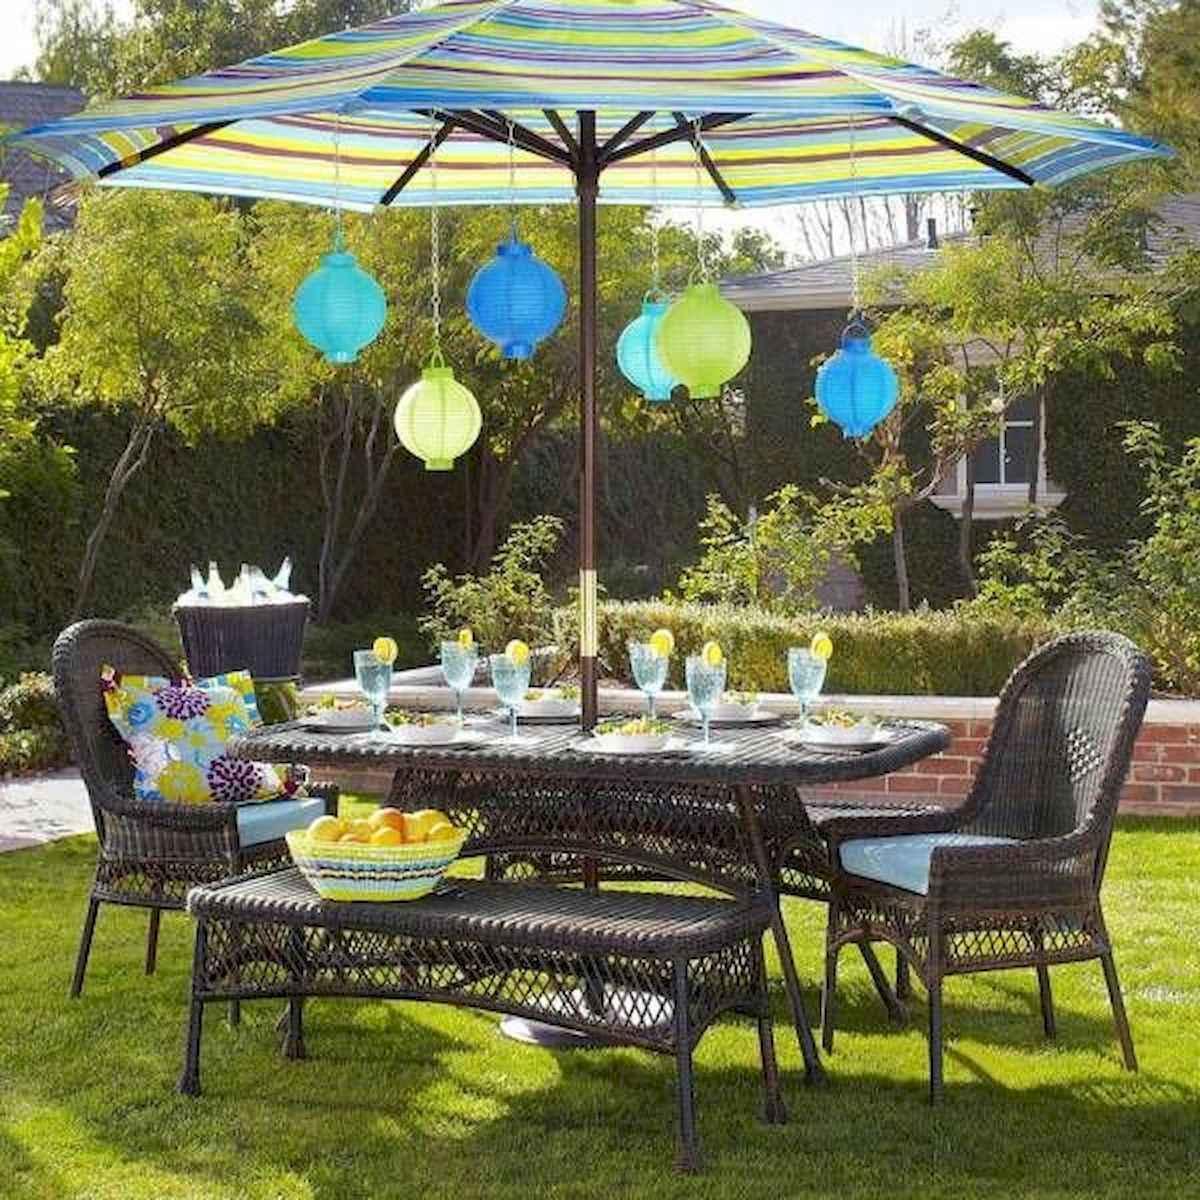 50 Awesome Summer Backyard Decor Ideas Make Your Summer Beautiful (19)